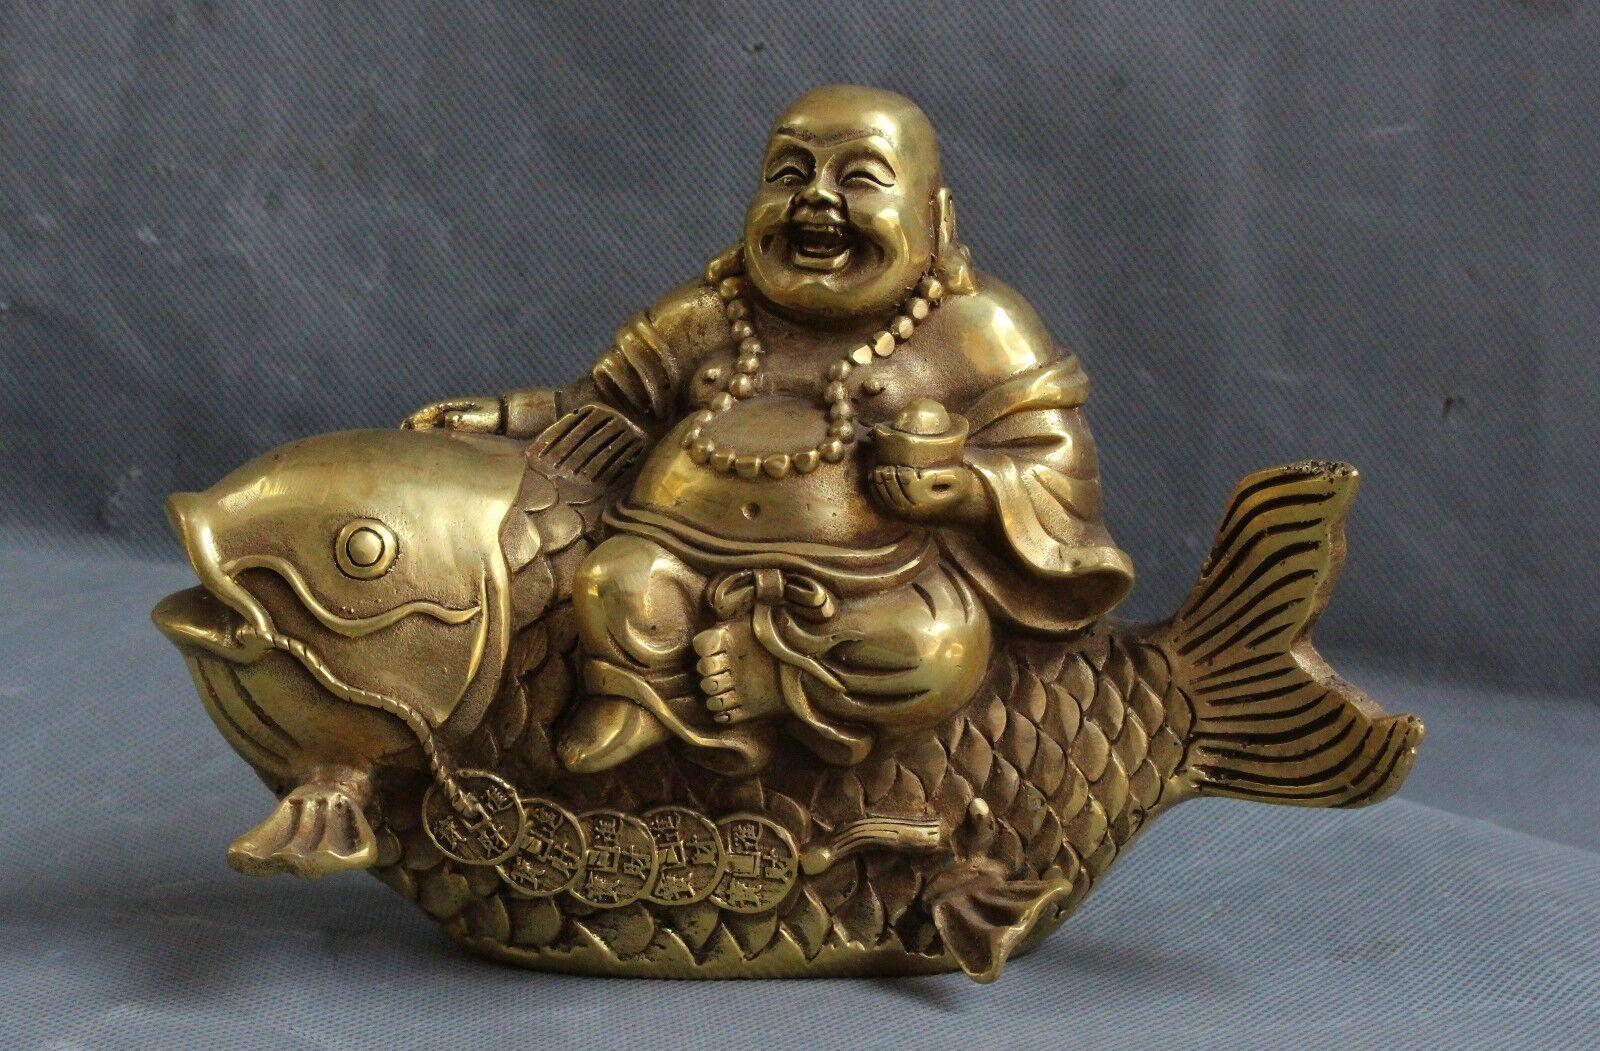 China Bronze Brass Yuan bao wealth Happy Laugh Maitreya Buddha Ride Fish Statue